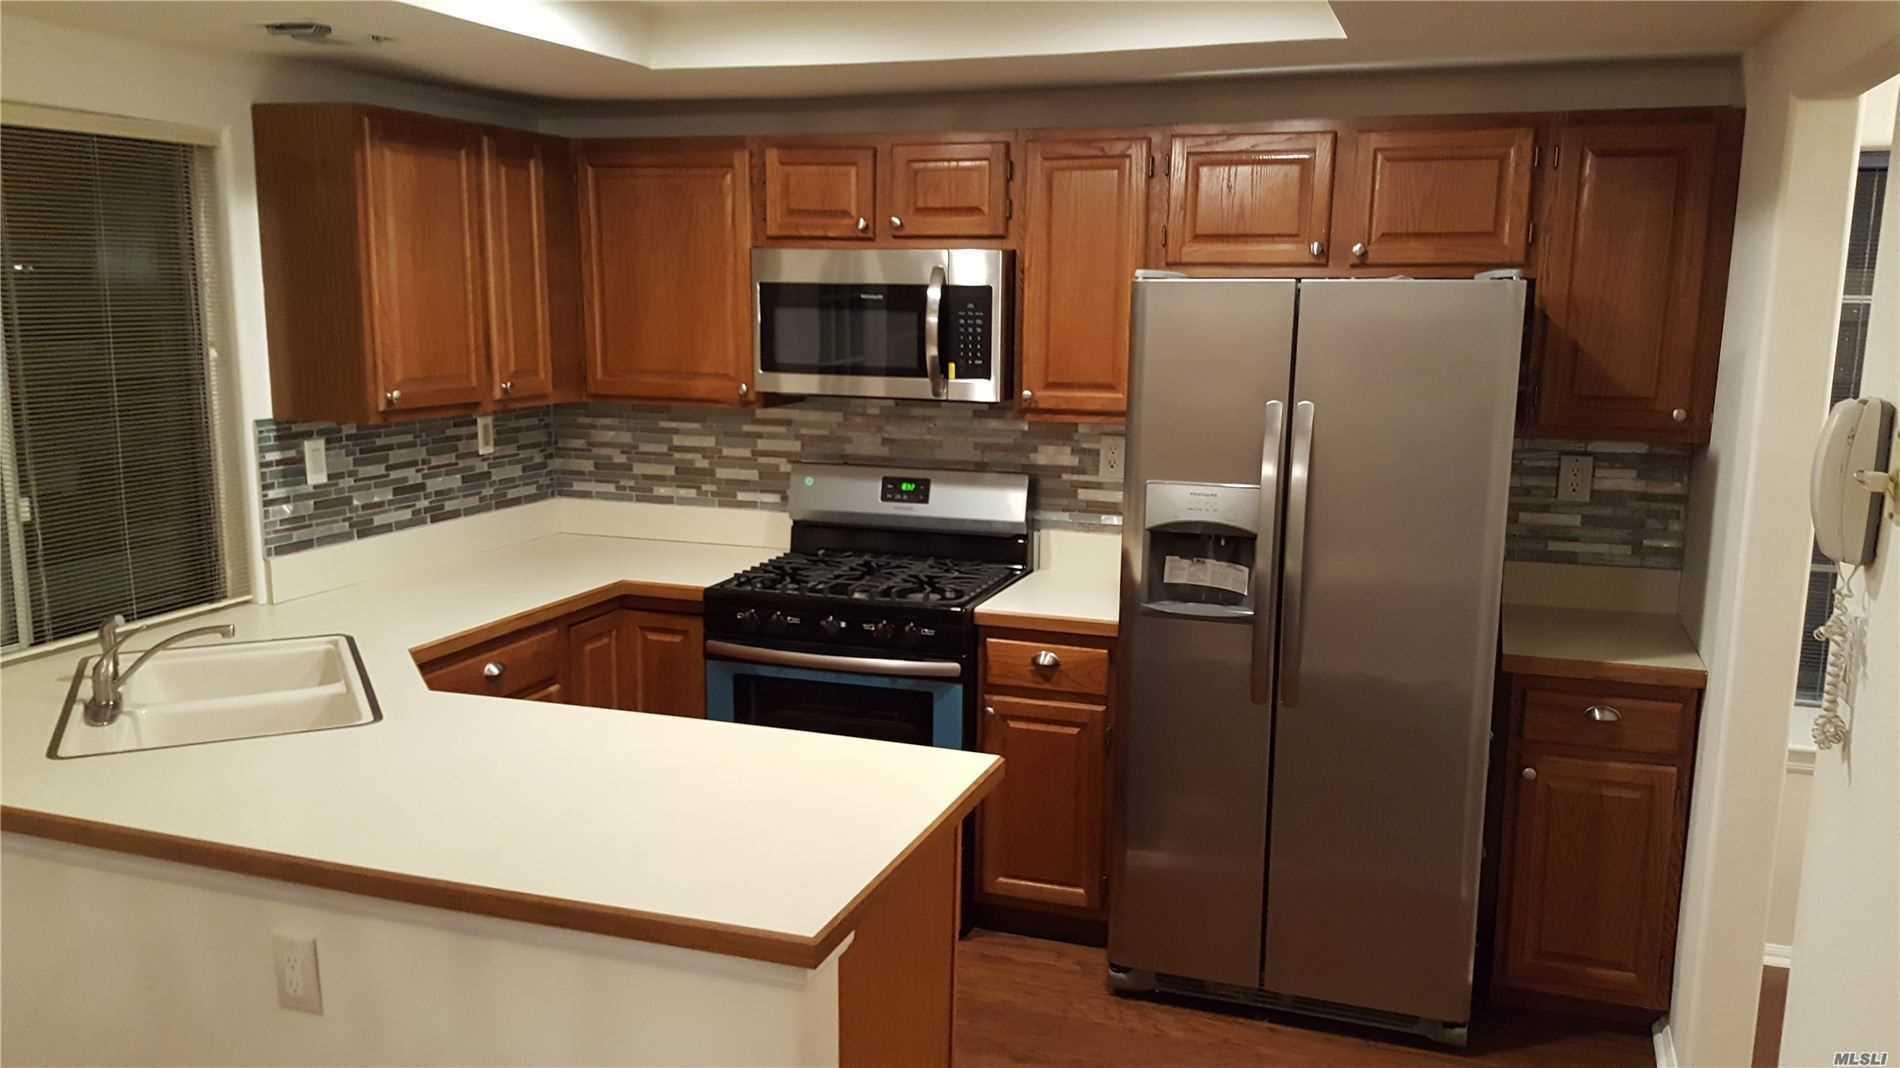 Property for sale at 131 Glen Drive, Ridge NY 11961, Ridge,  New York 11961